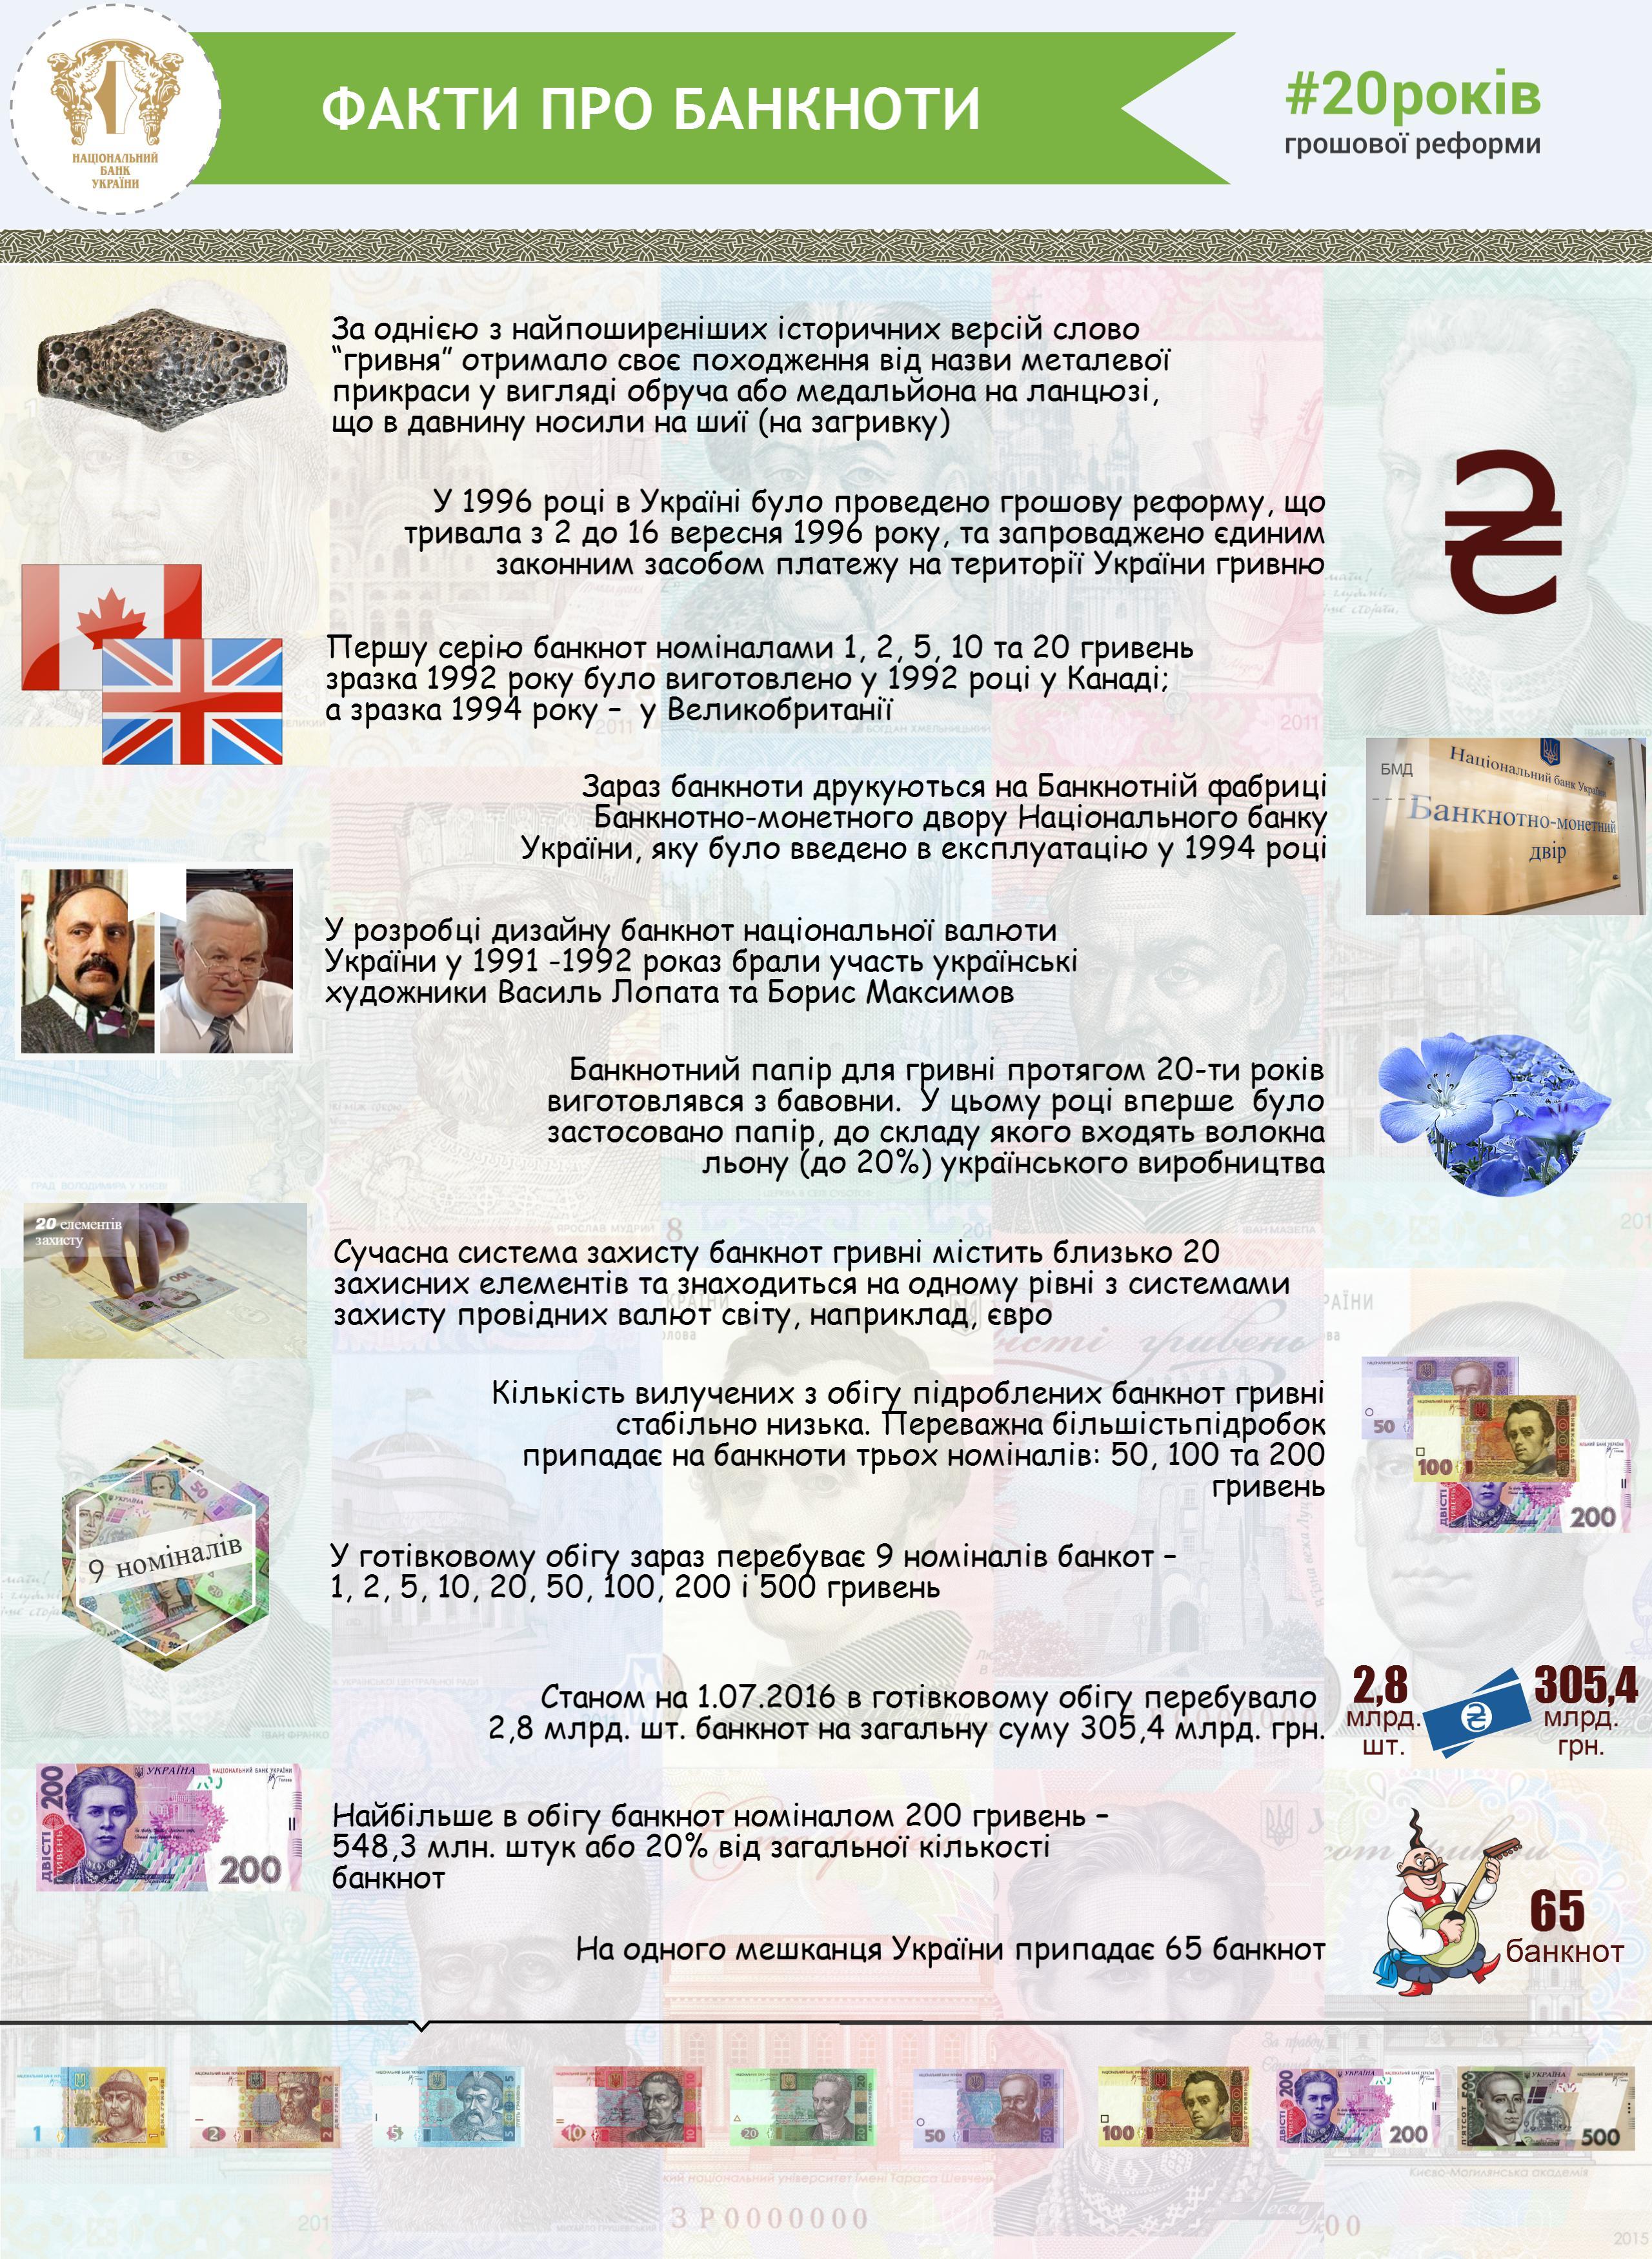 факти про банкноти 2560